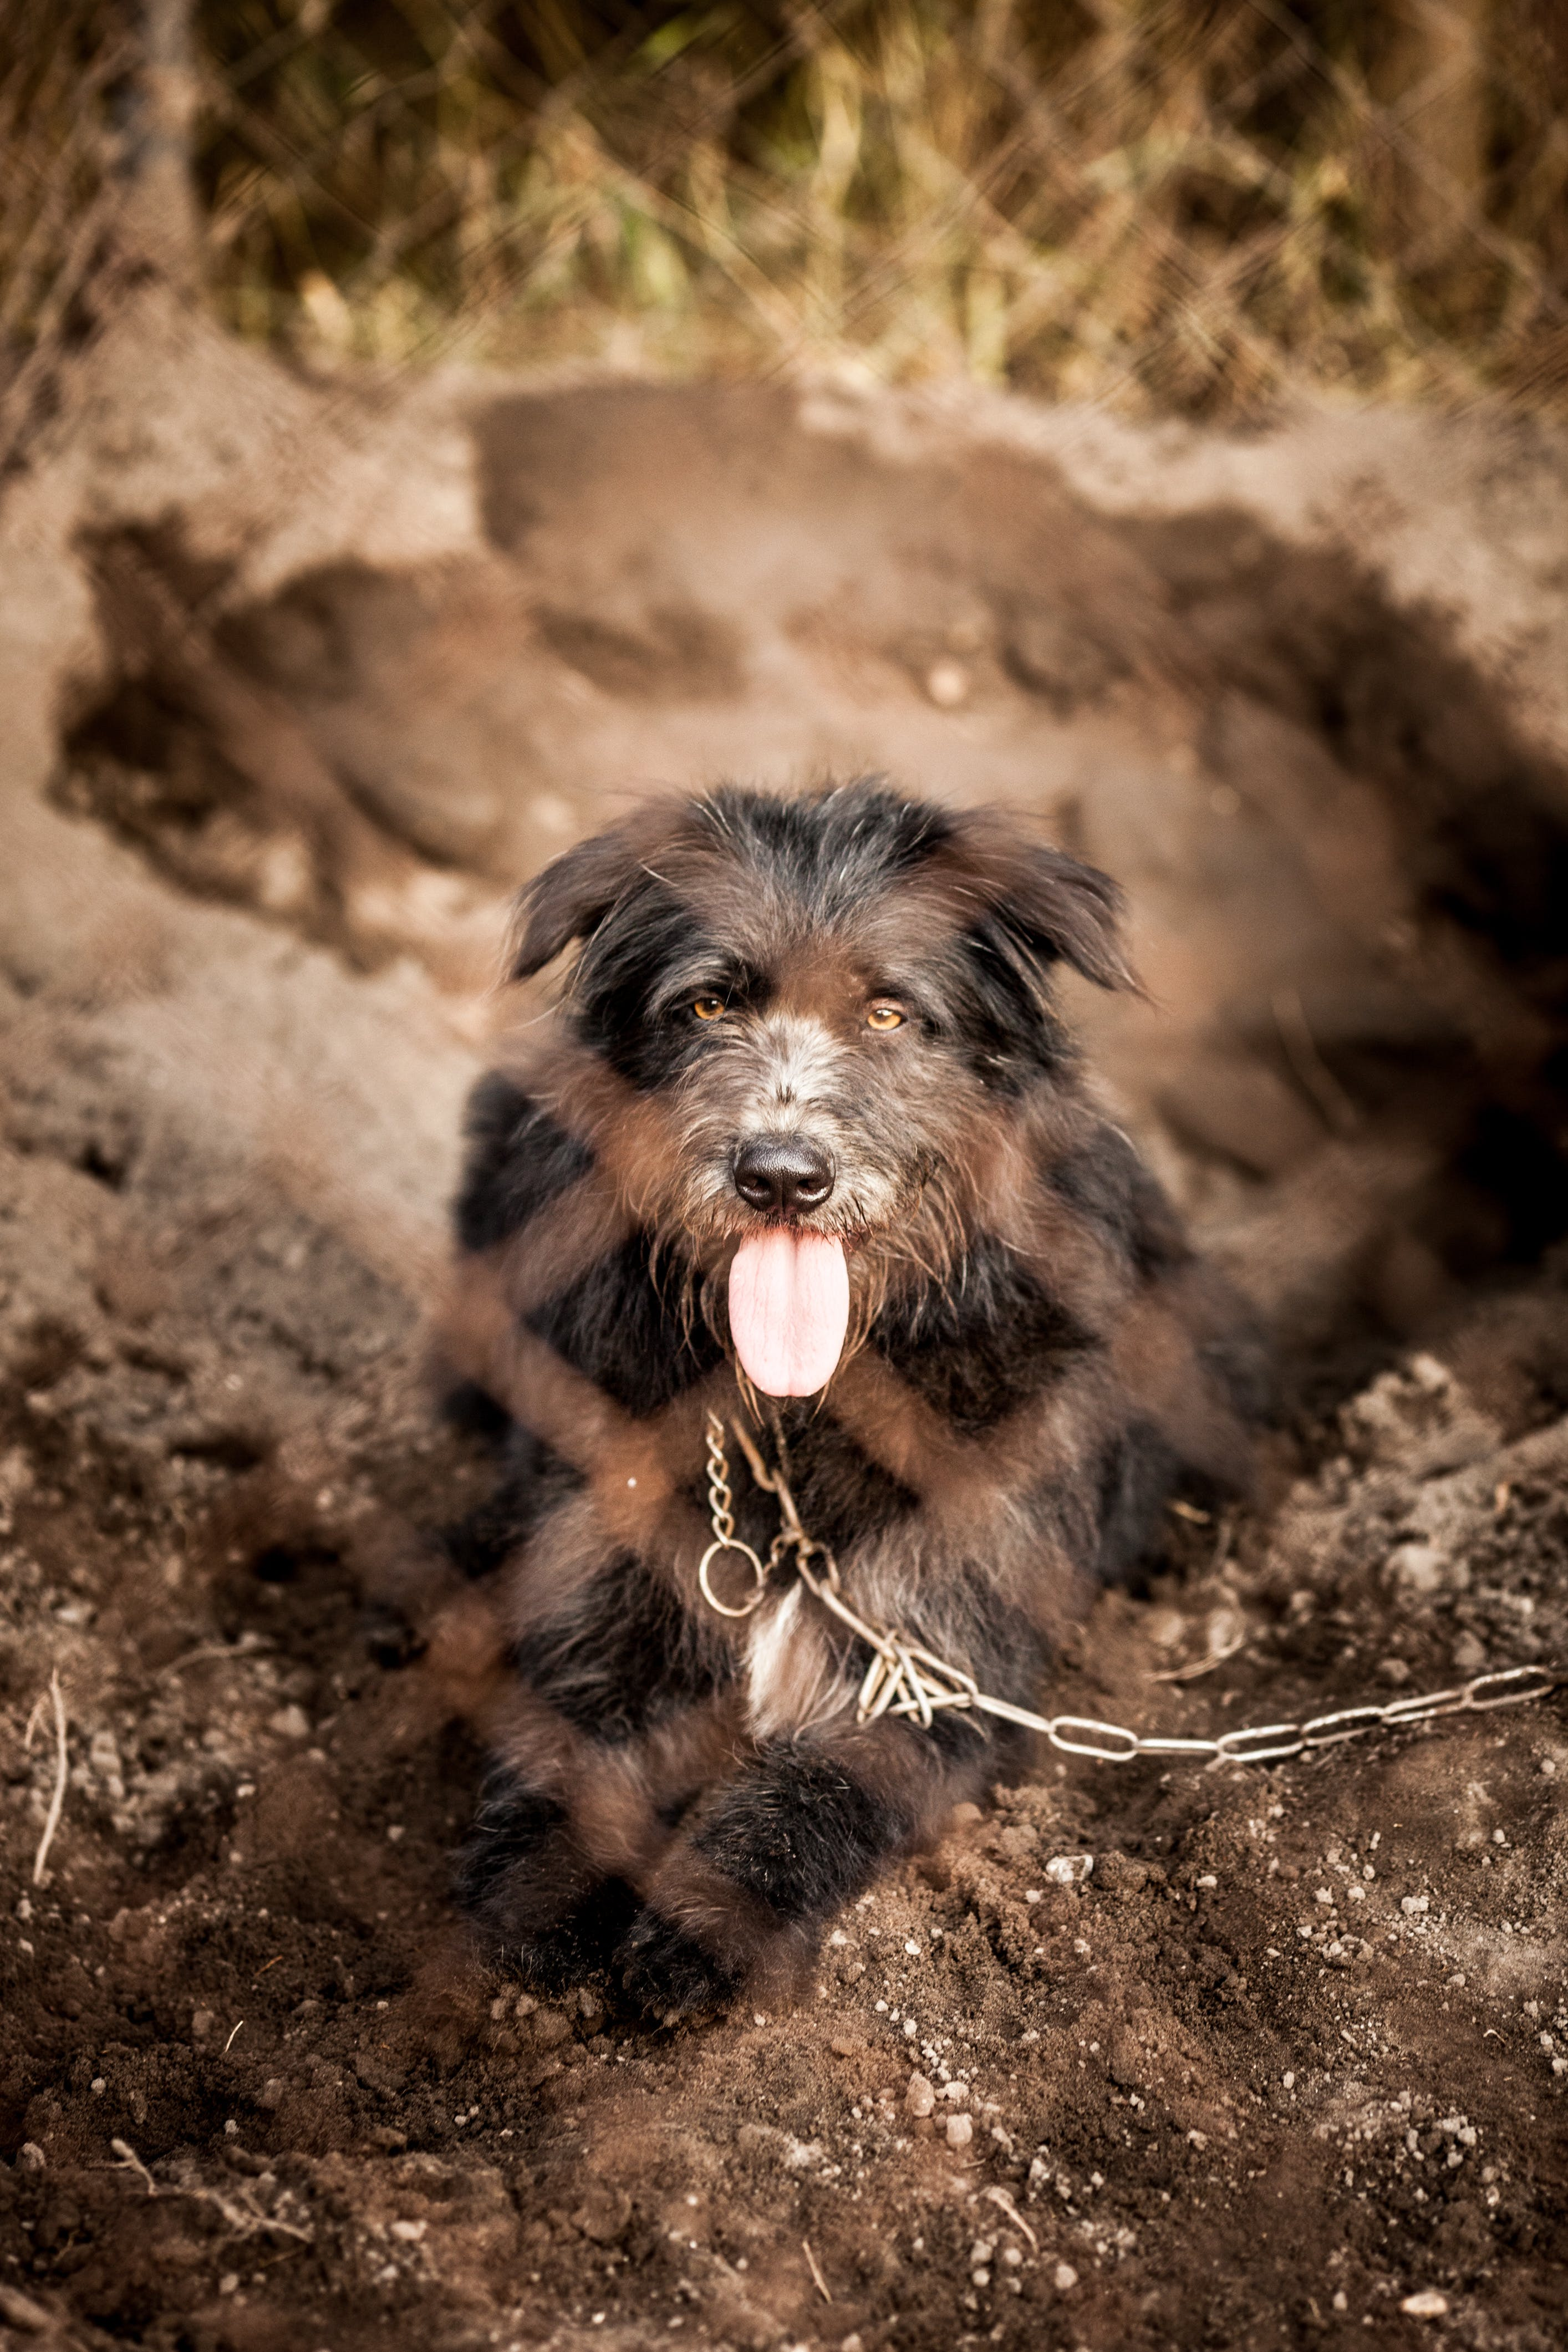 hund, obdachloser hund, streunender hund